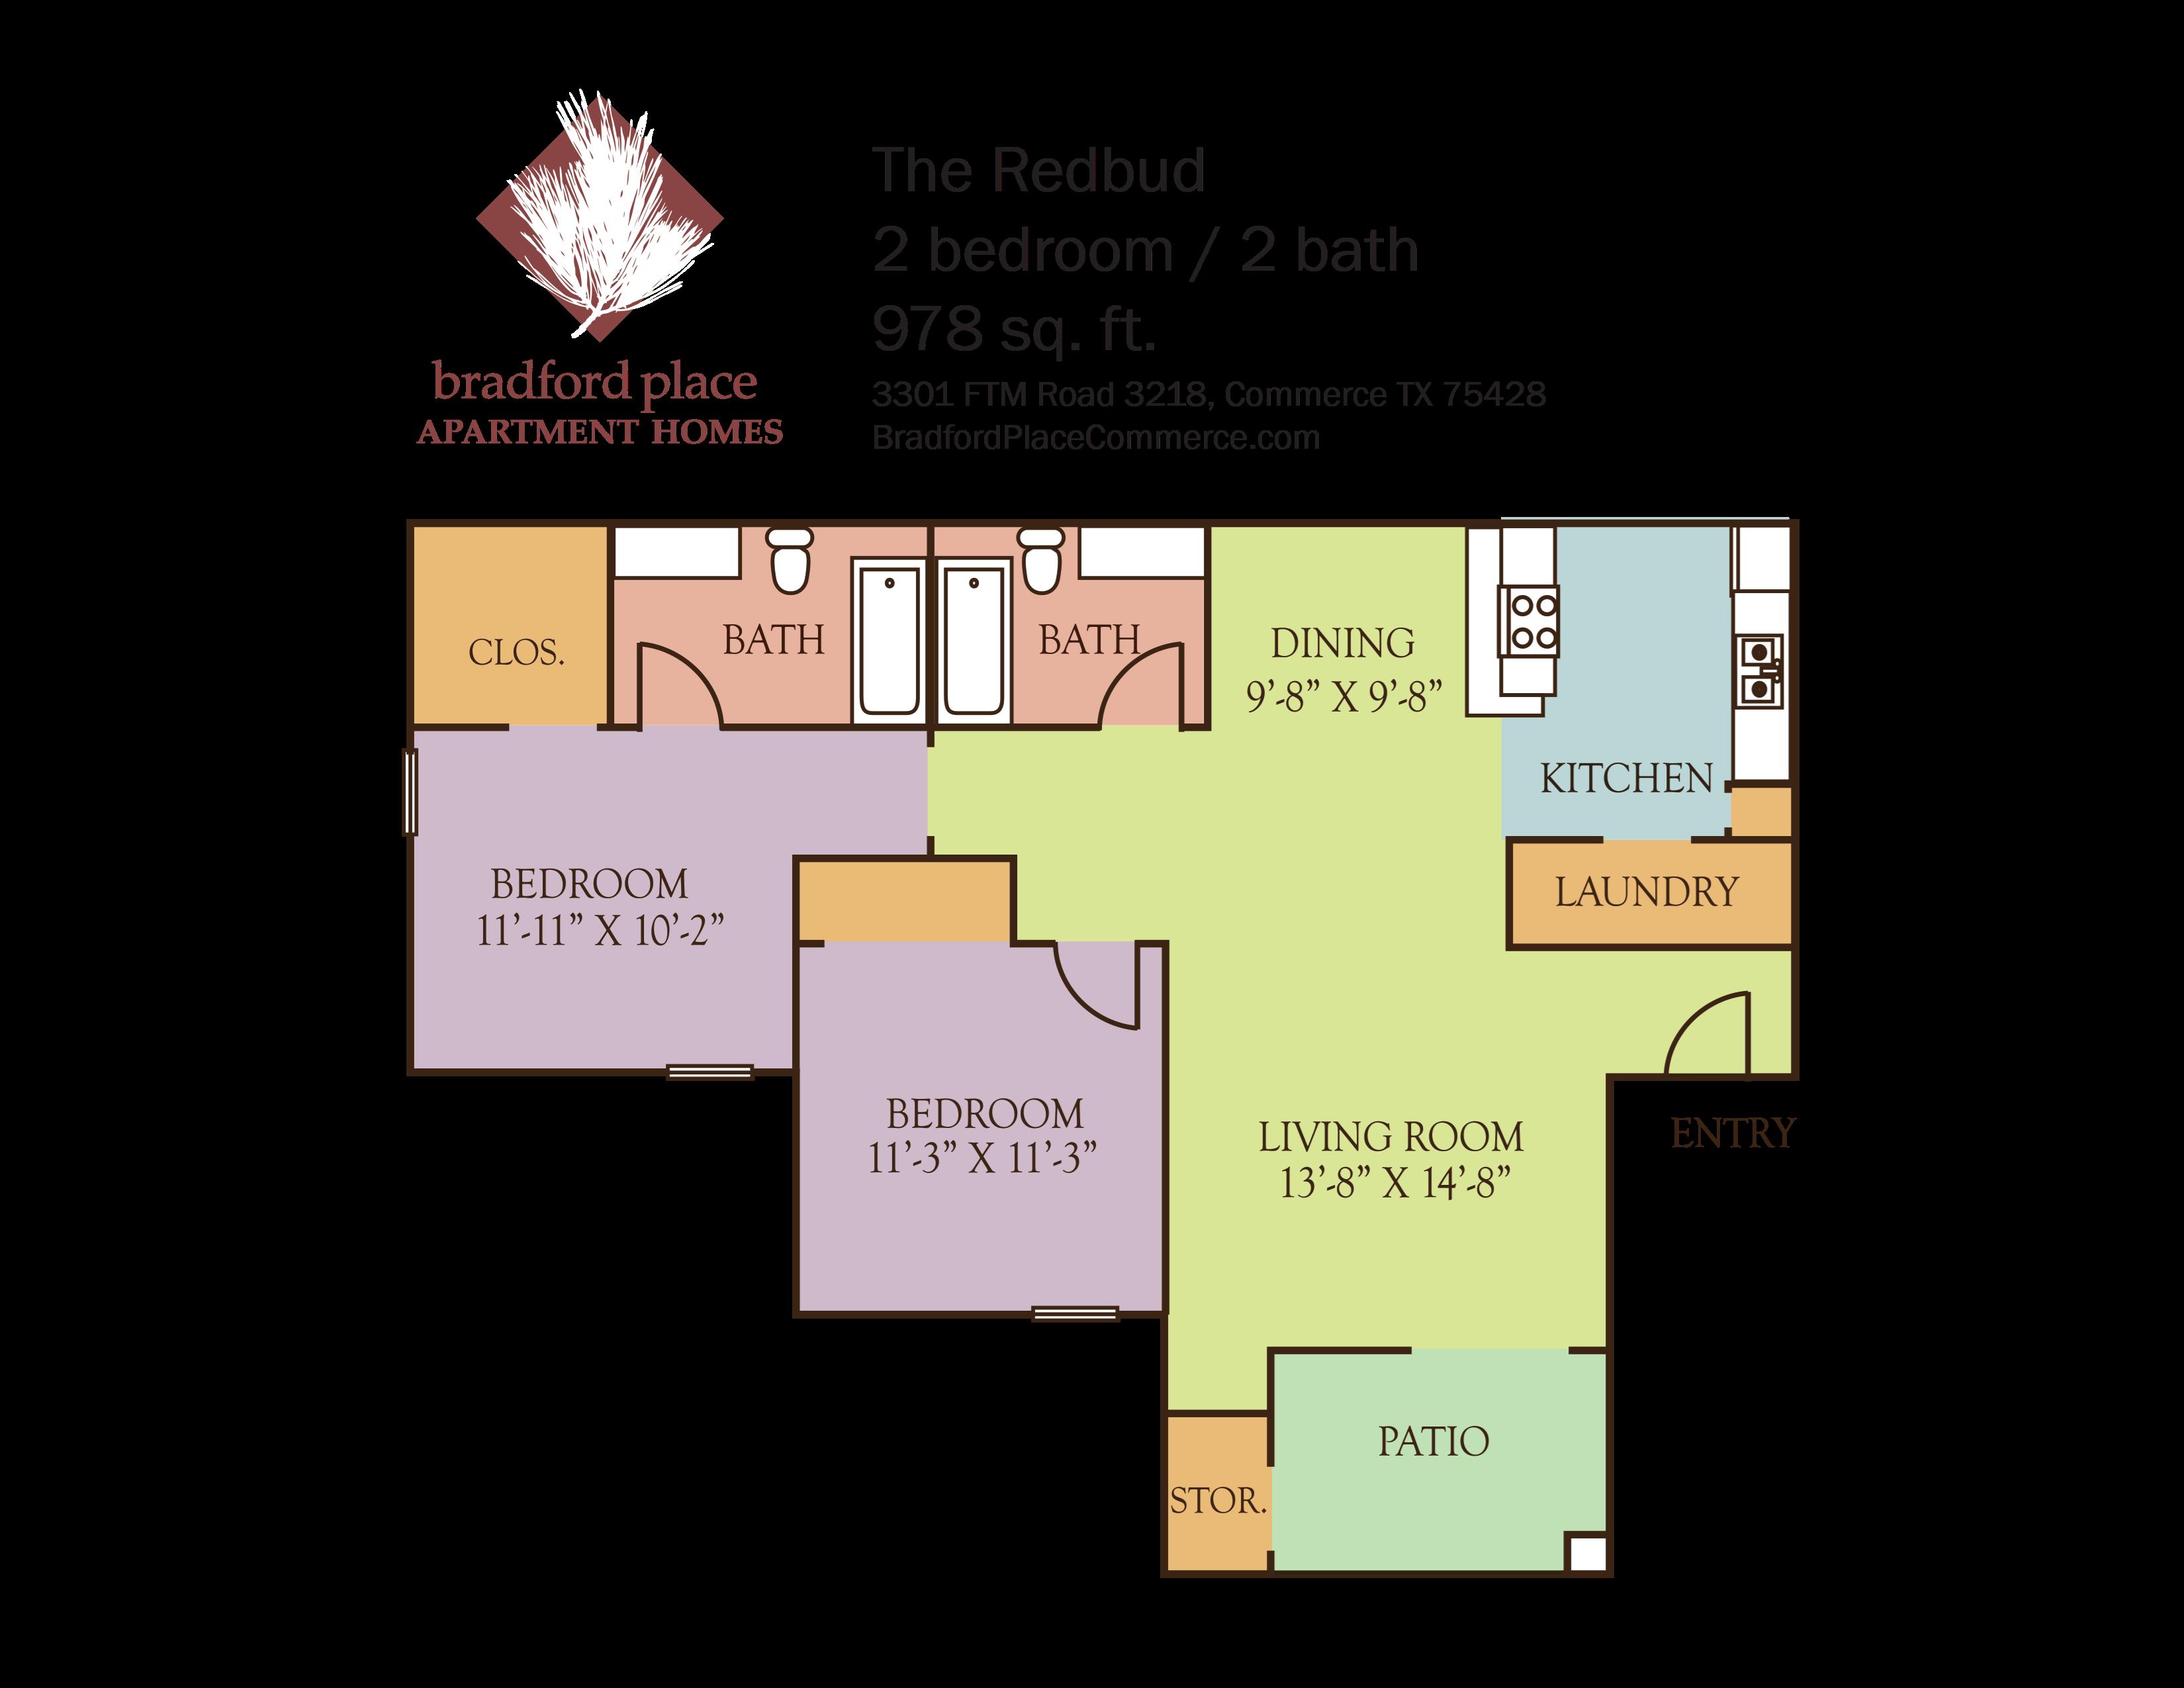 The Redbud Floor Plan 2